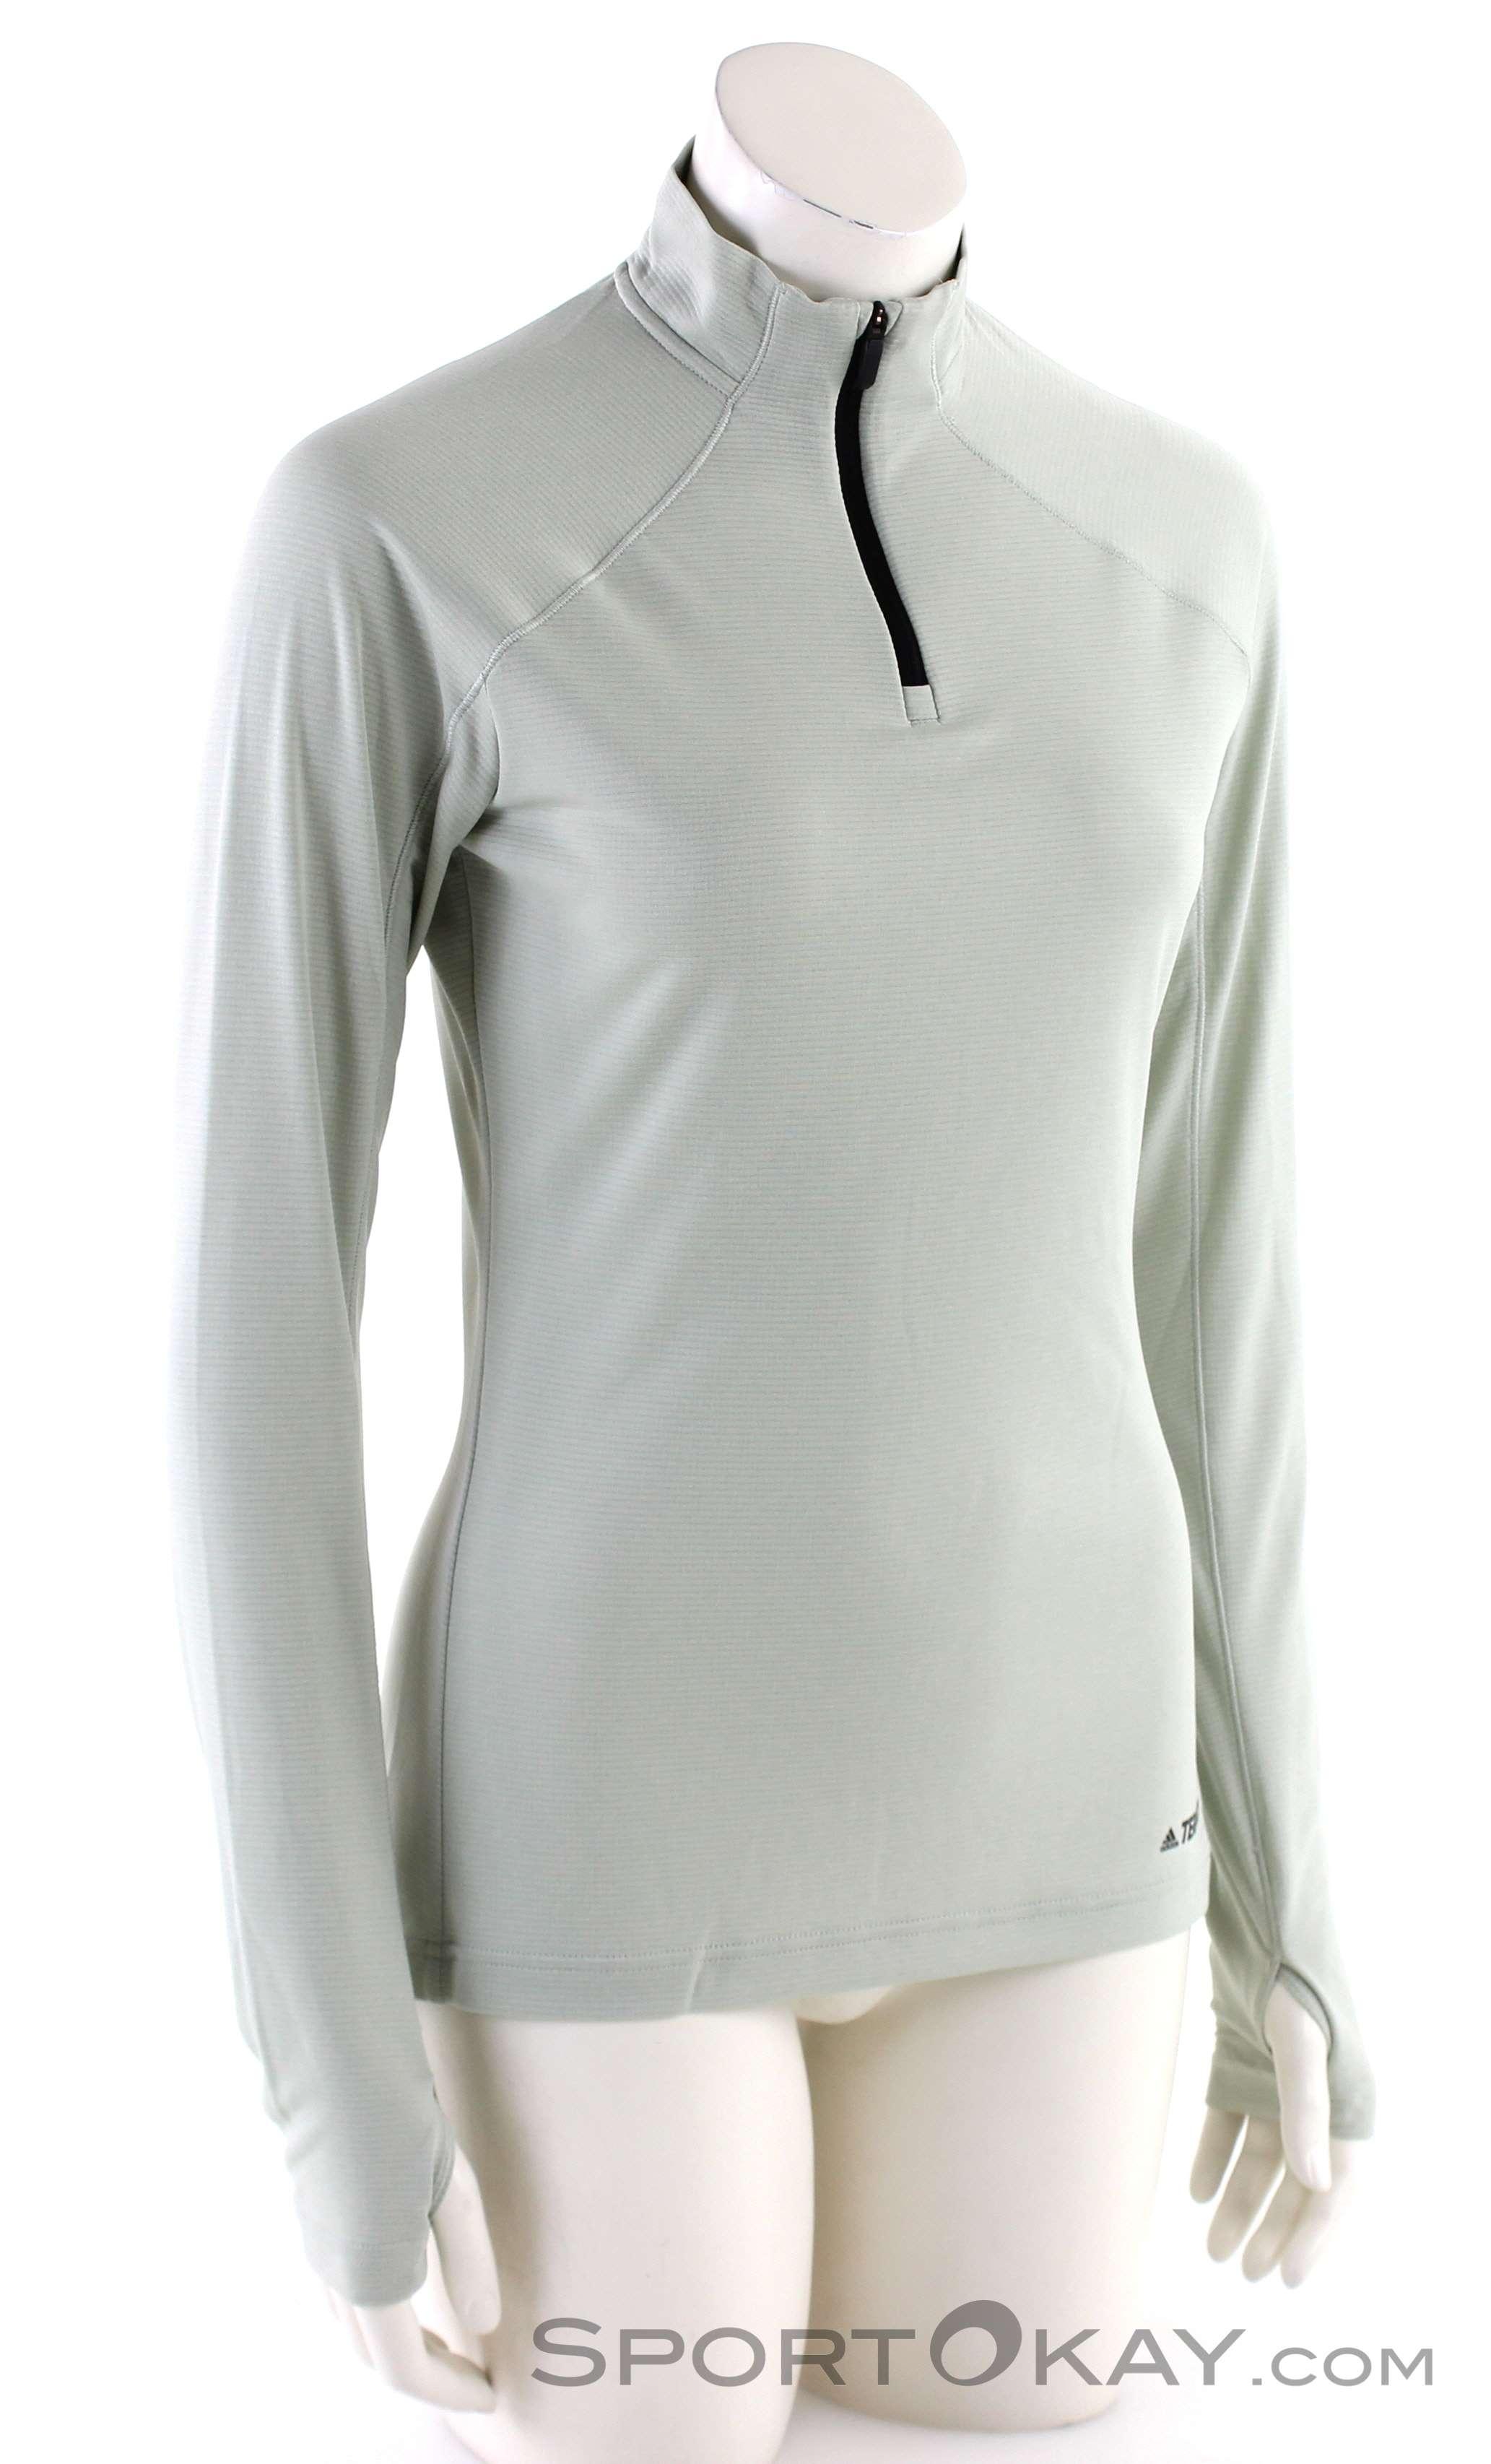 adidas Terrex Trace Ro 1/2 LS Damen Shirt-Grau-40